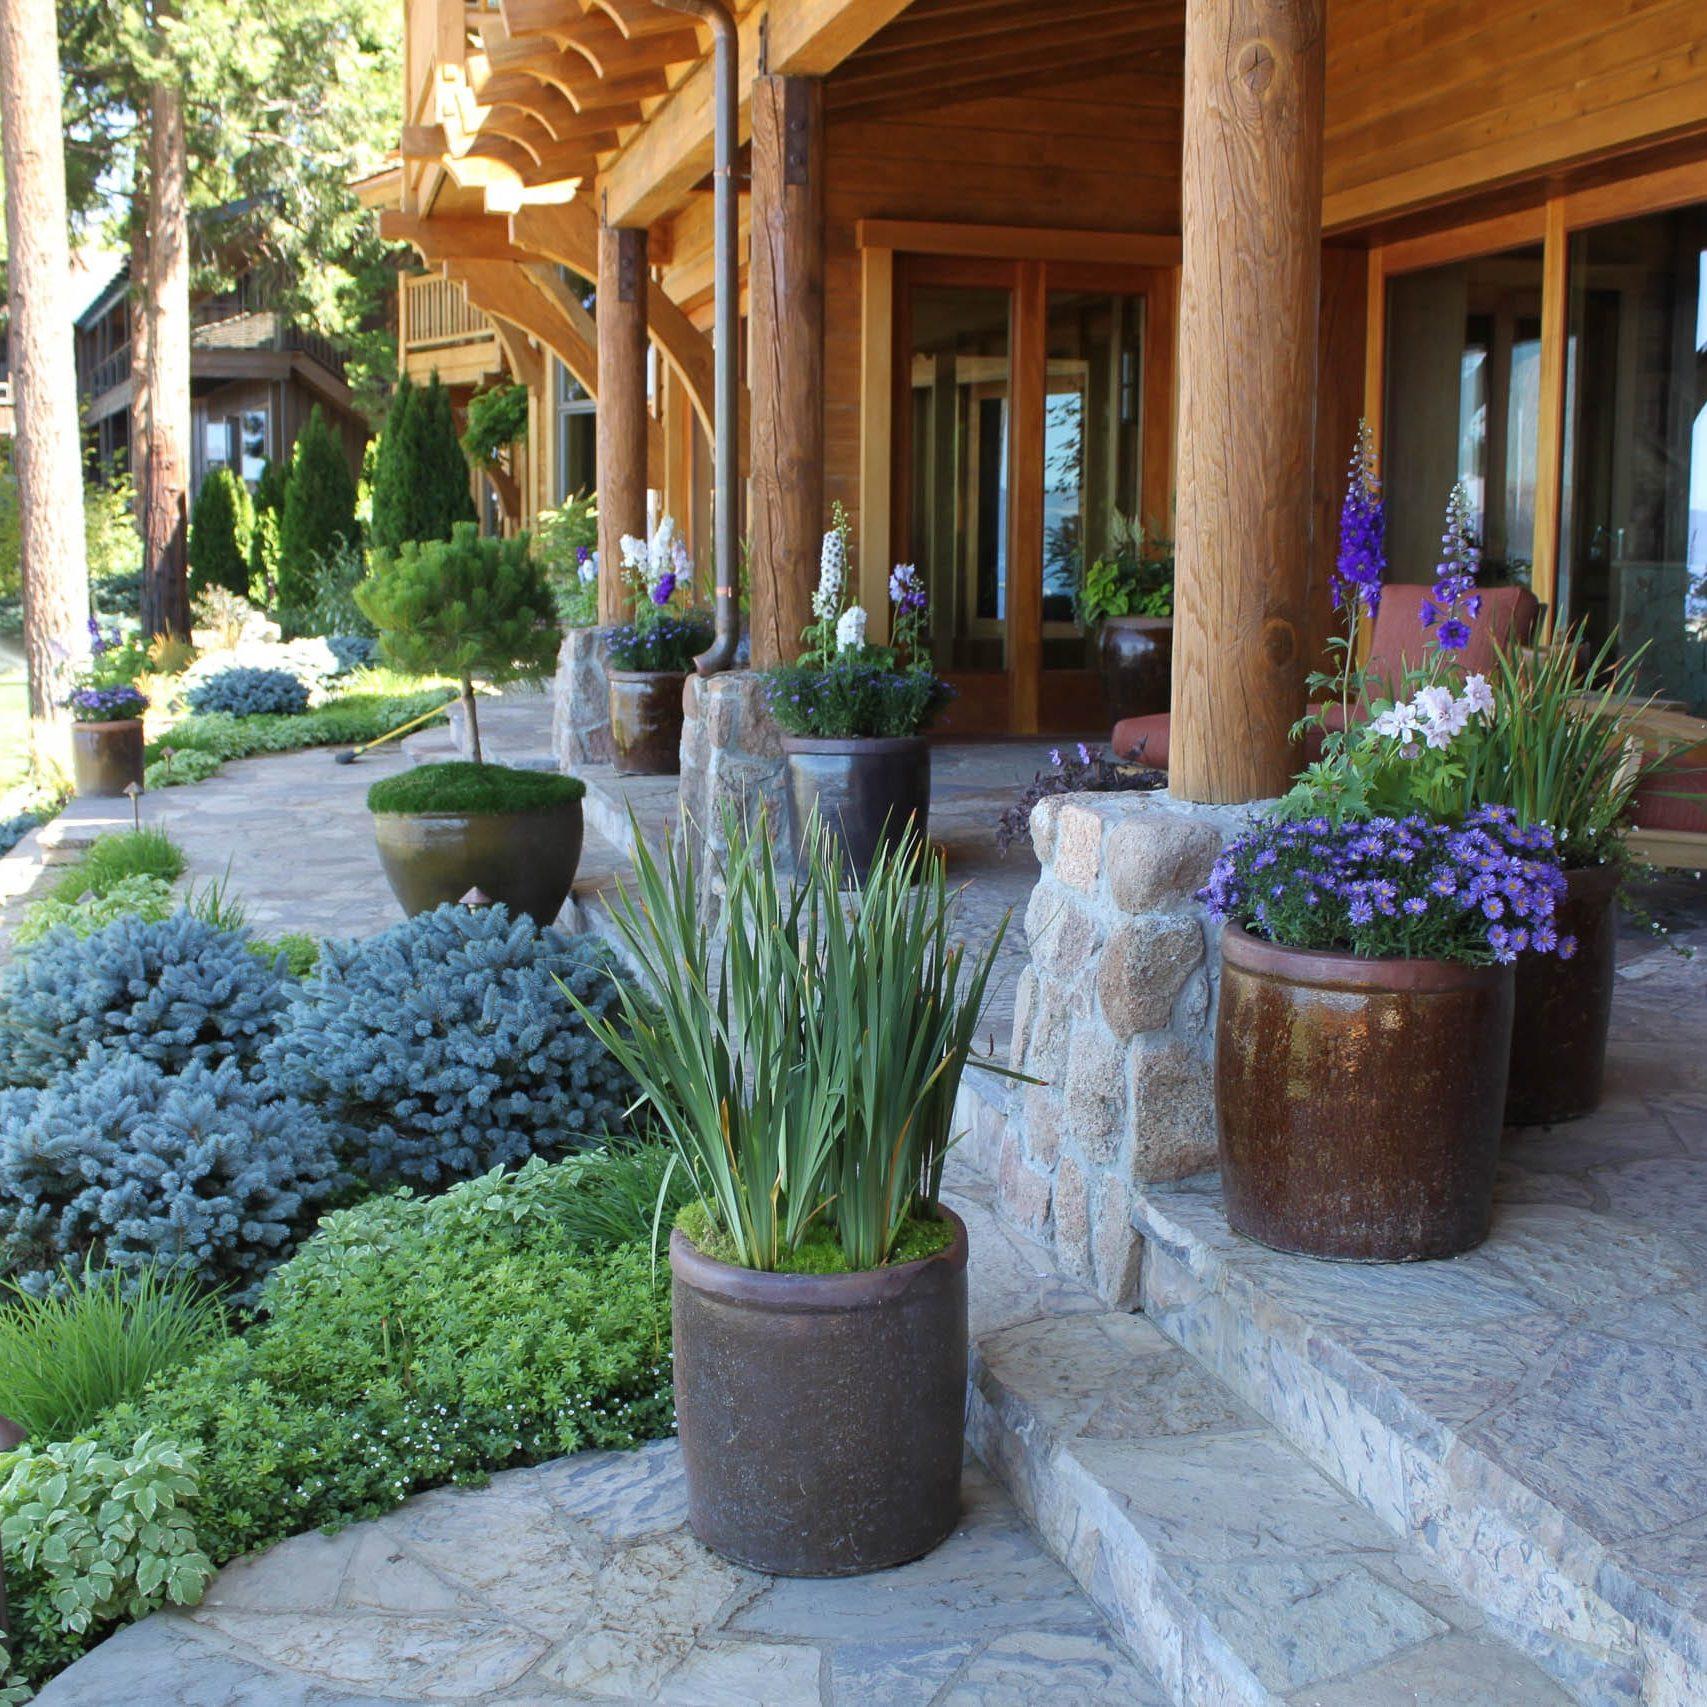 Truckee, California Landscaping Company Reviews